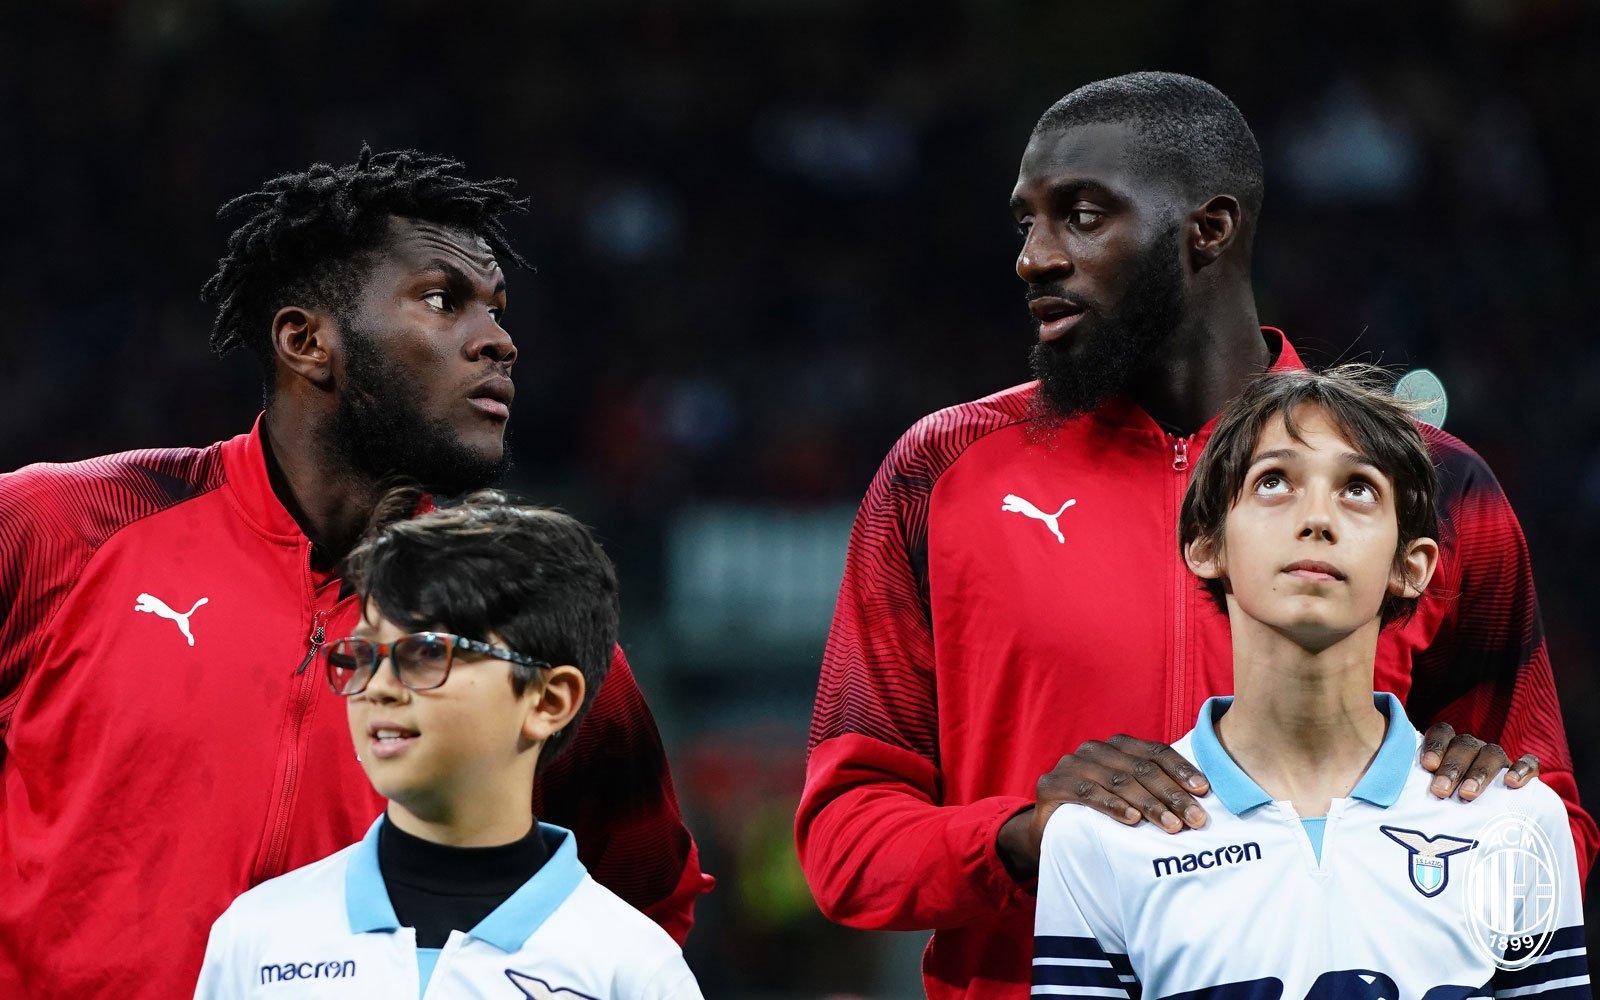 Tiémoué Bakayoko and Franck Kessié before Milan-Lazio at Stadio San Siro on April 24, 2019. (@acmilan.com)